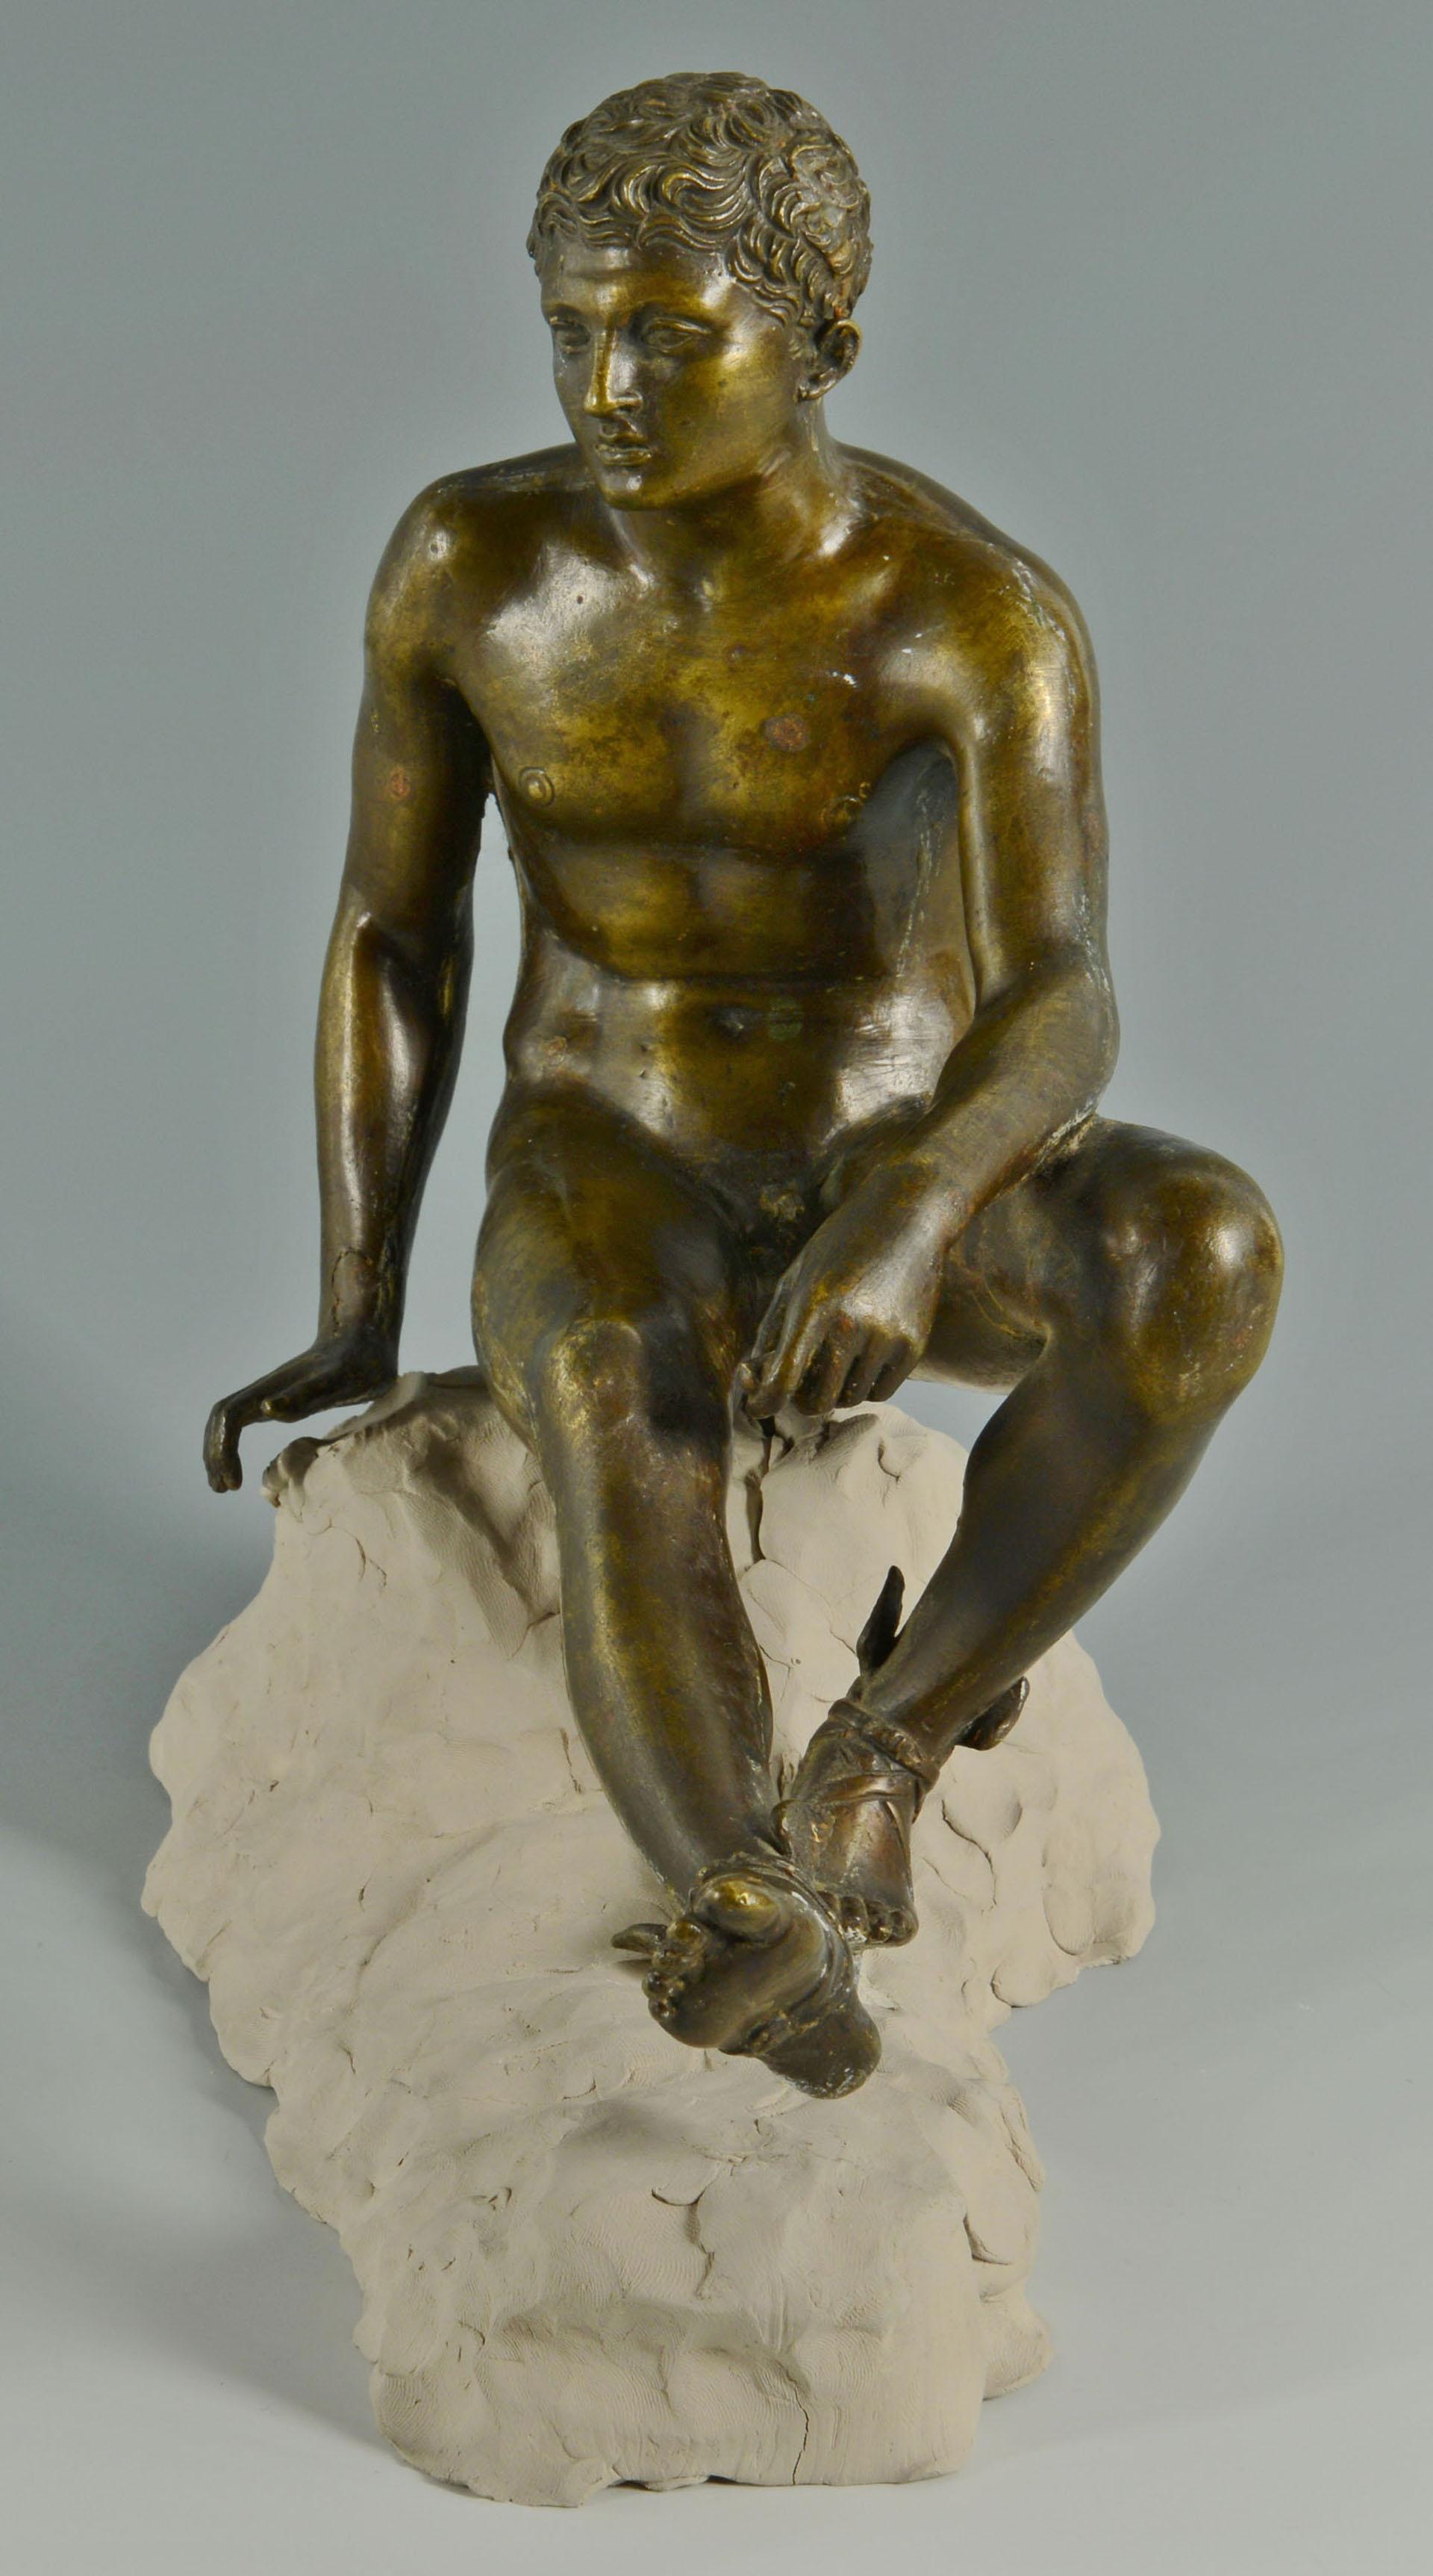 Bronze Sculpture of Hermes Sommer Artistic Foundry